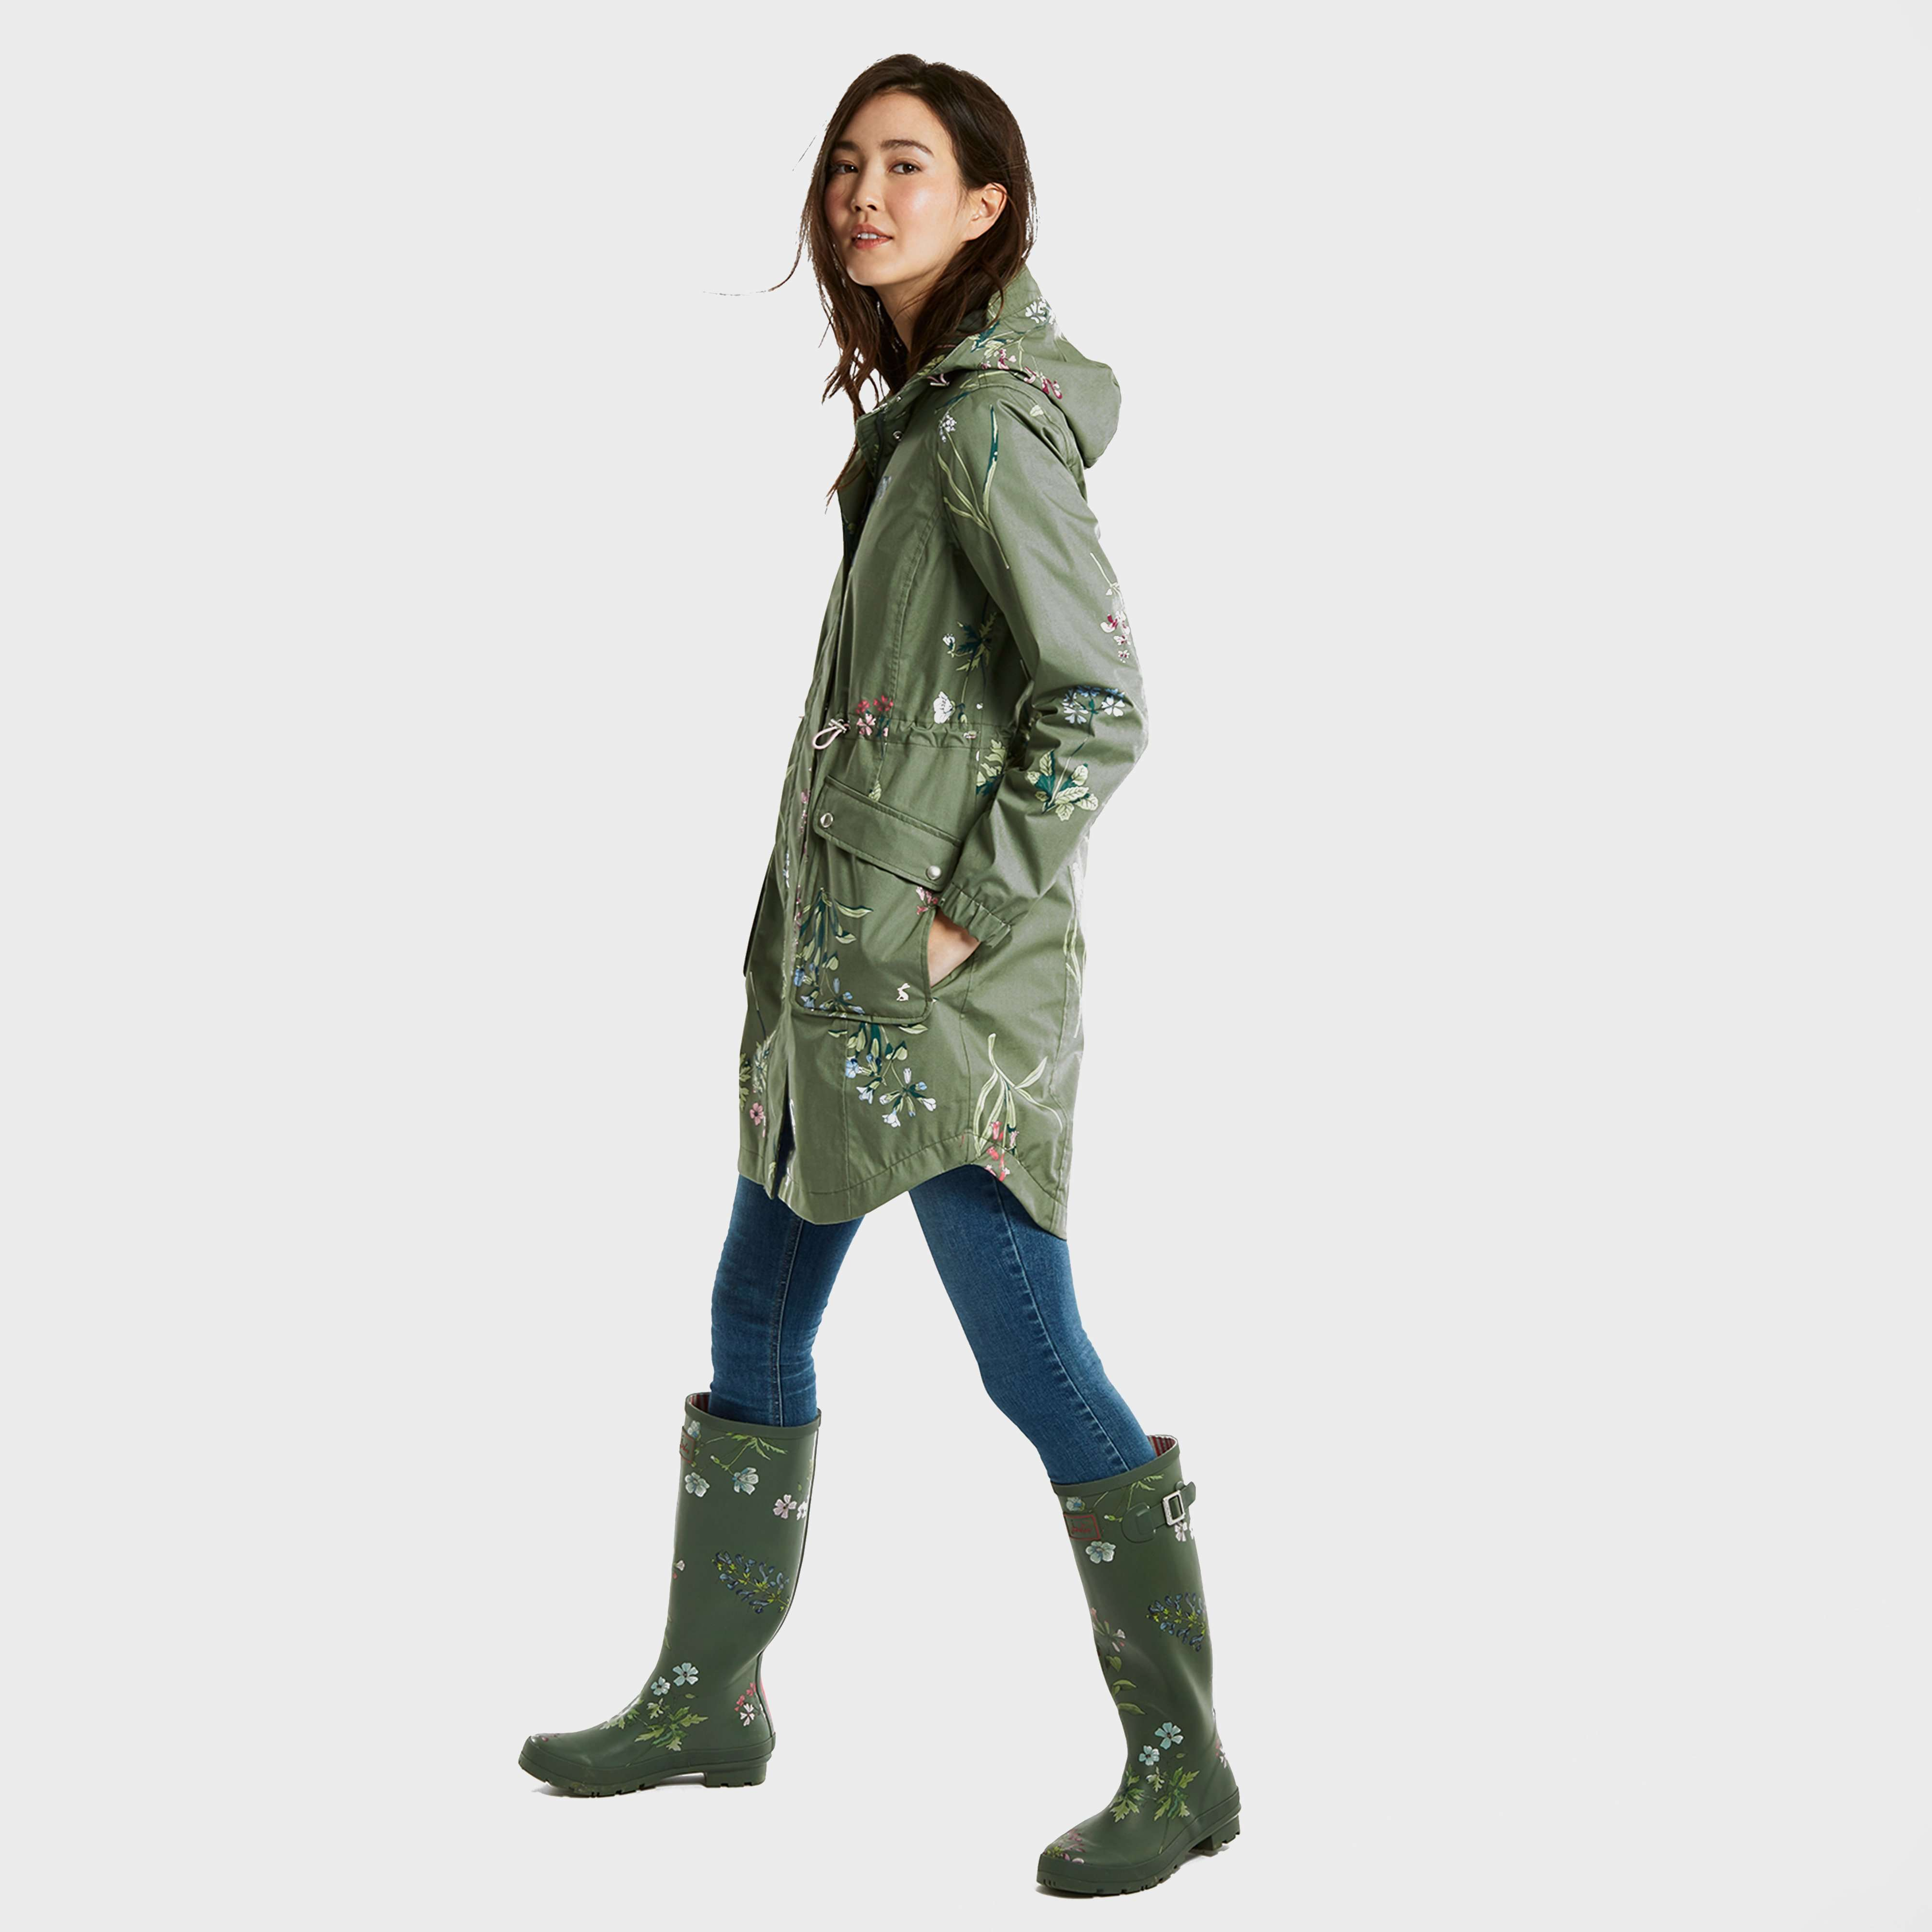 JOULES Women's Coastline Waterproof Jacket